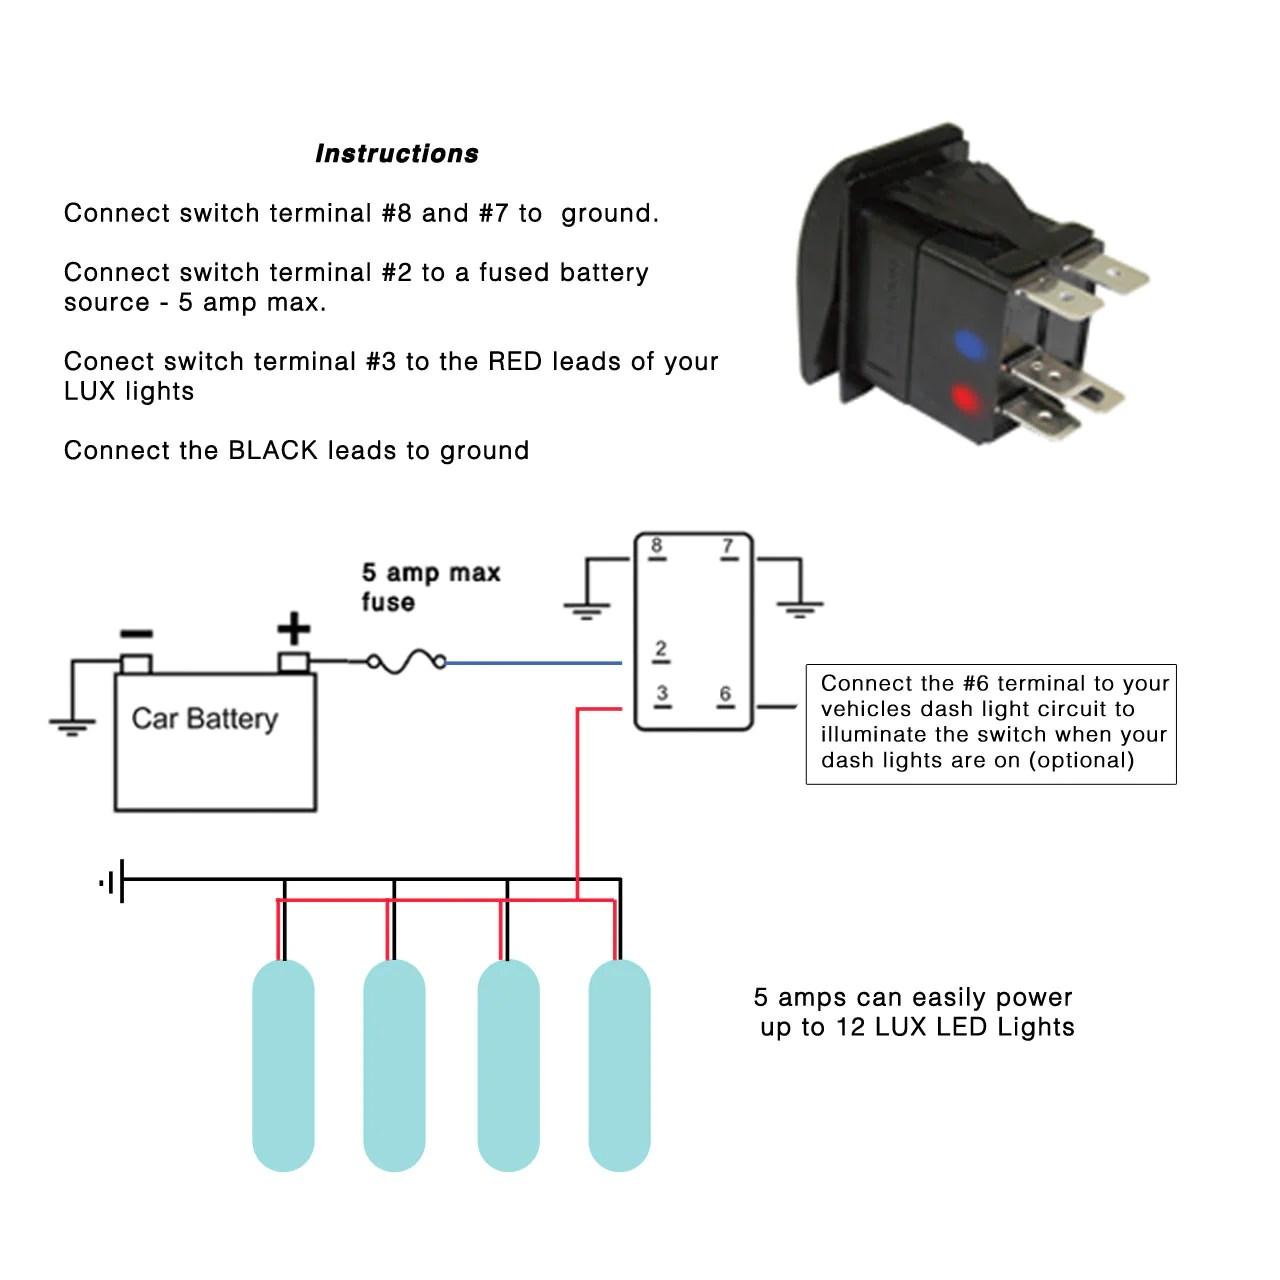 hight resolution of pin toggle switch wiring diagram image wiring 6 pole toggle switch wiring diagram 6 auto wiring illuminated